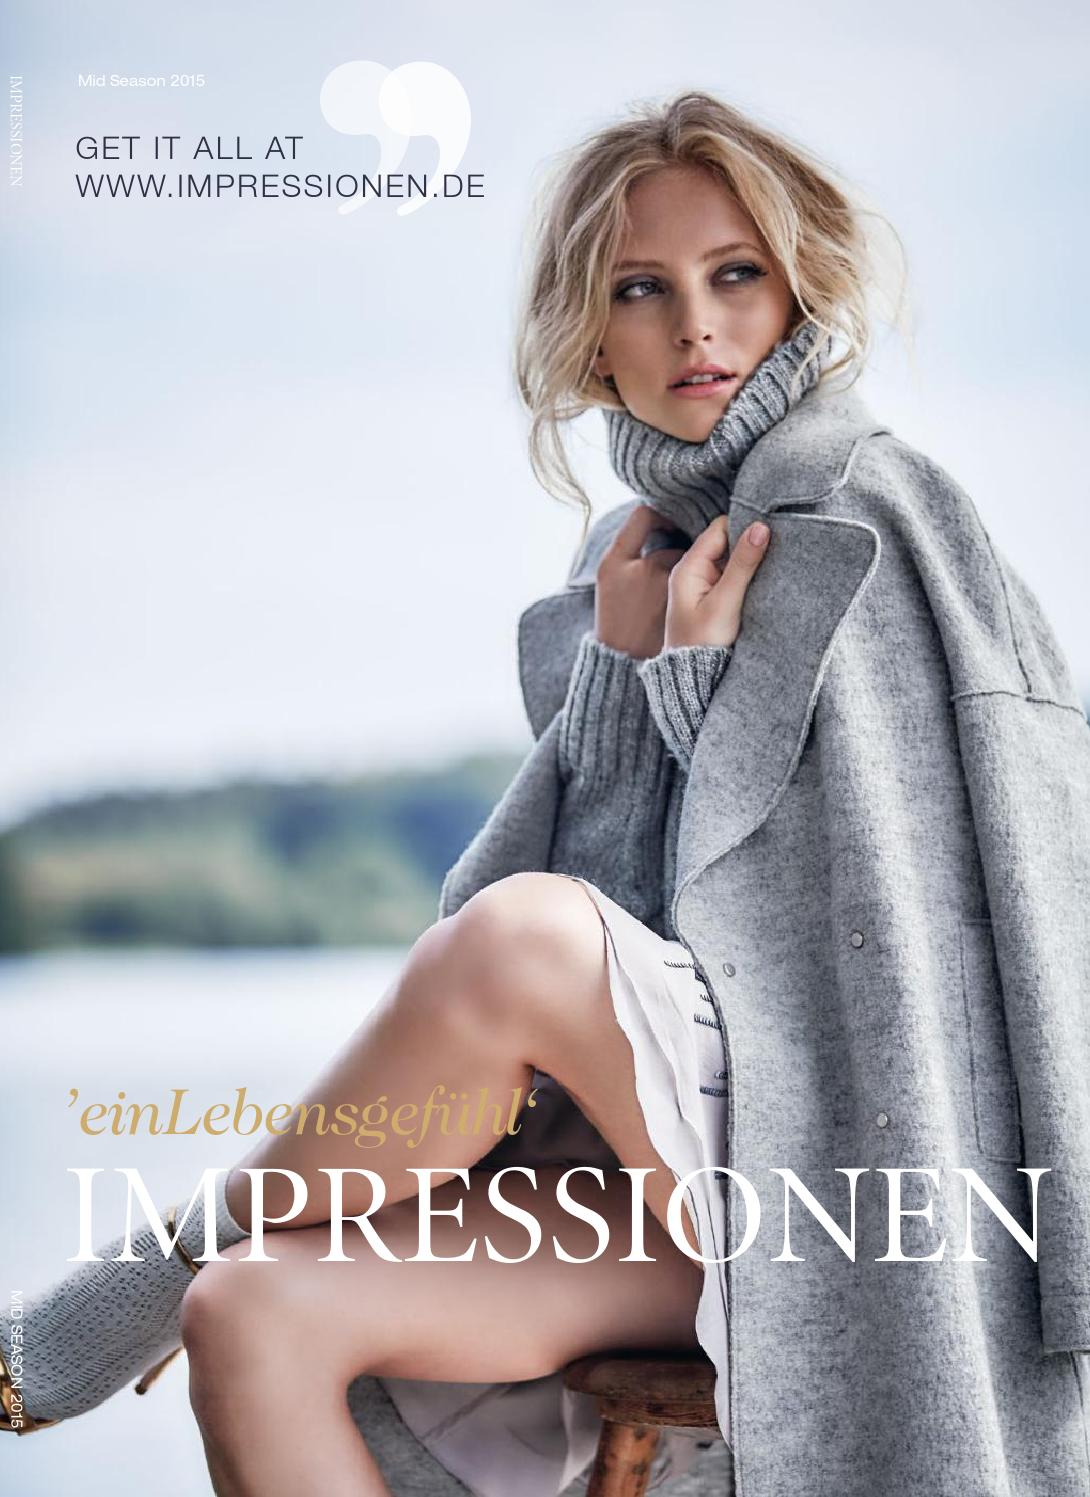 Impressionenh3 Осень Зима 201516 by katalog de.ru